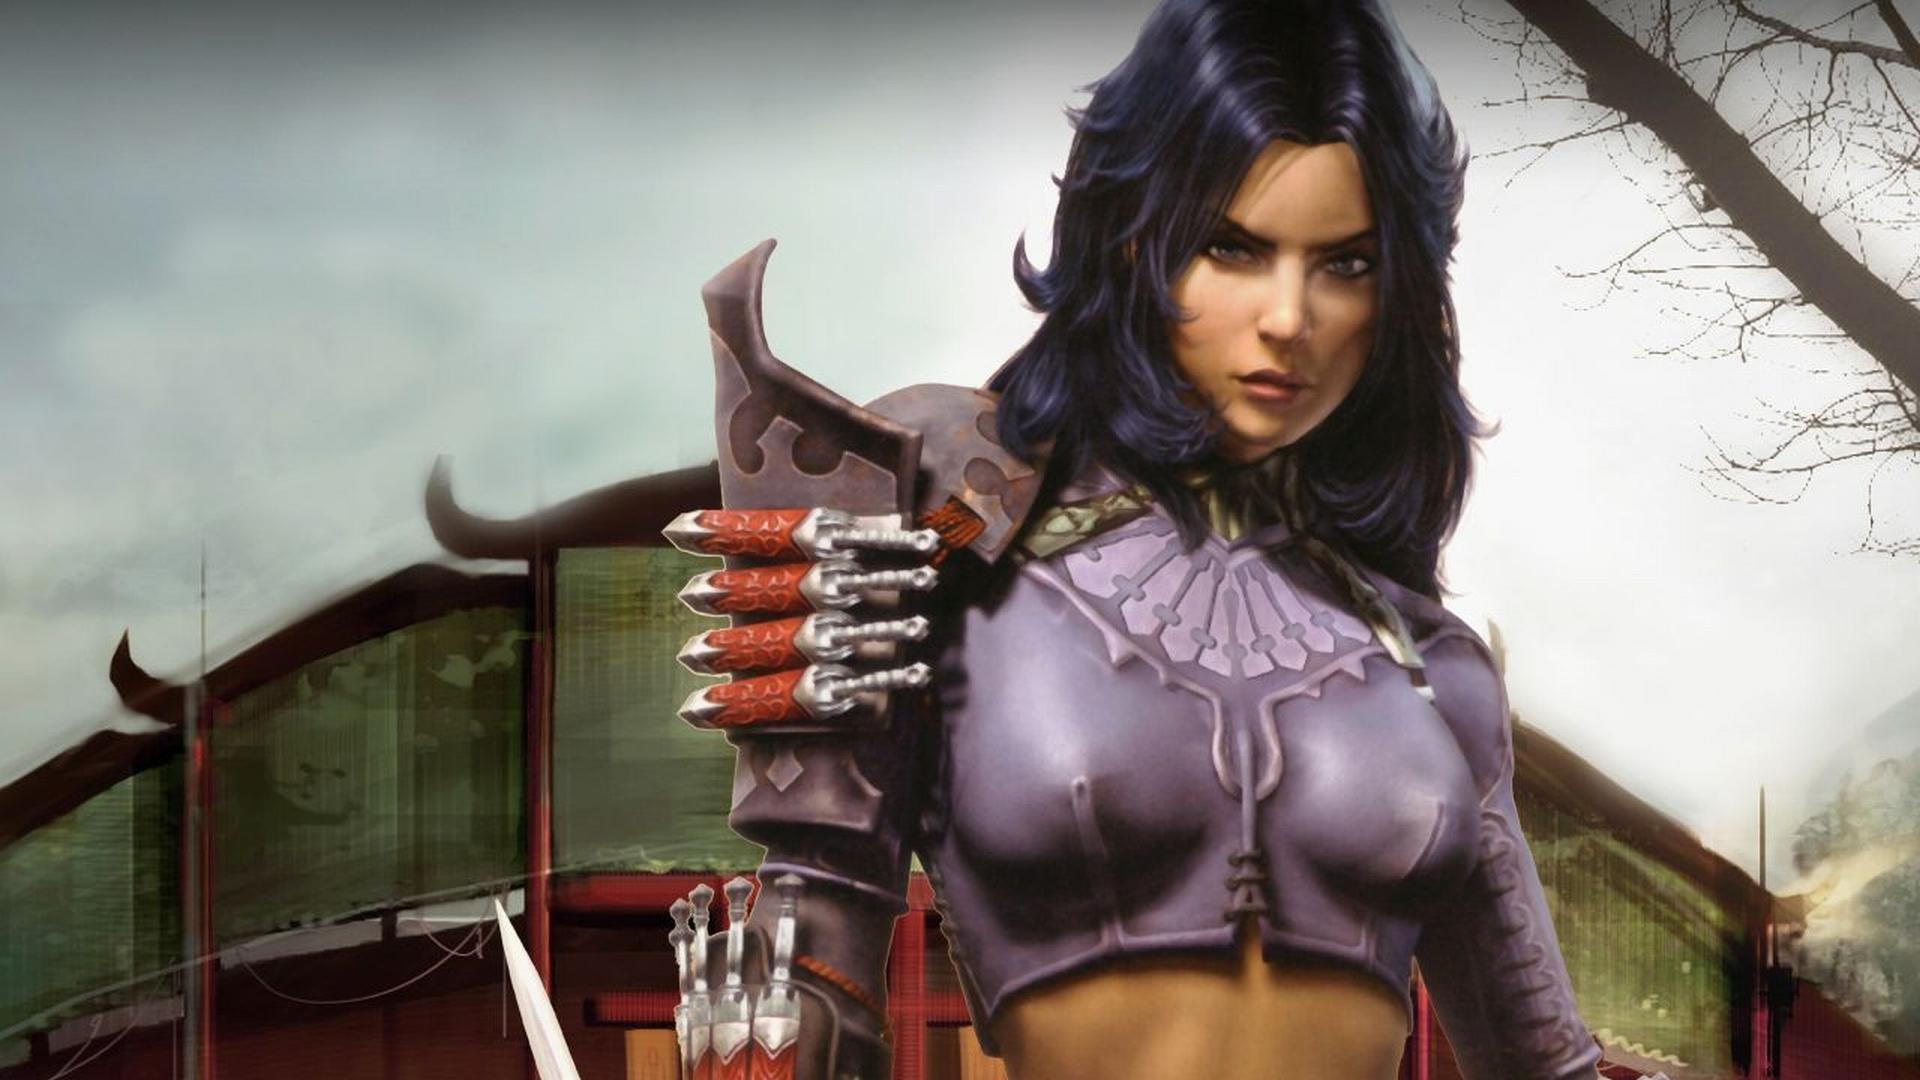 image Warrior girl alpha v2 animation gallery vo edit